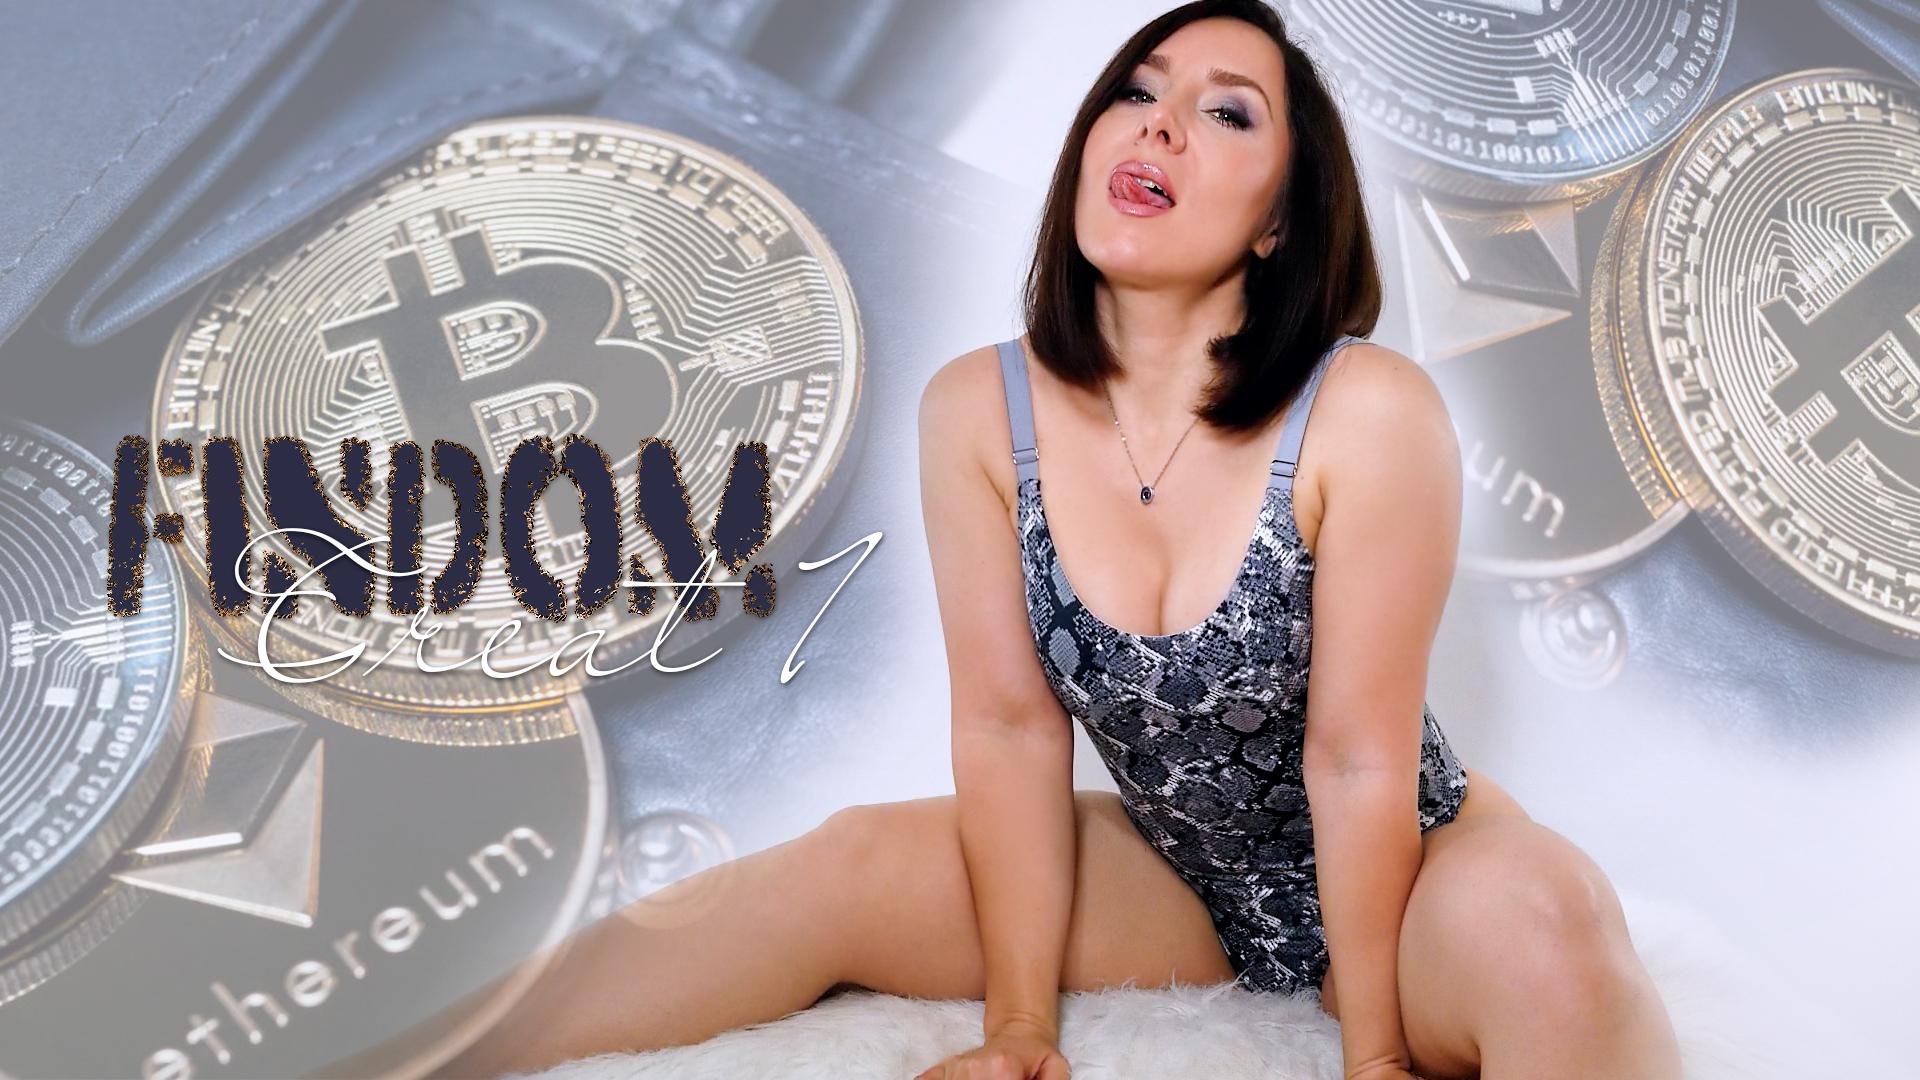 FinDom HypnoDom Financial Domination FinDomme Money Fetish